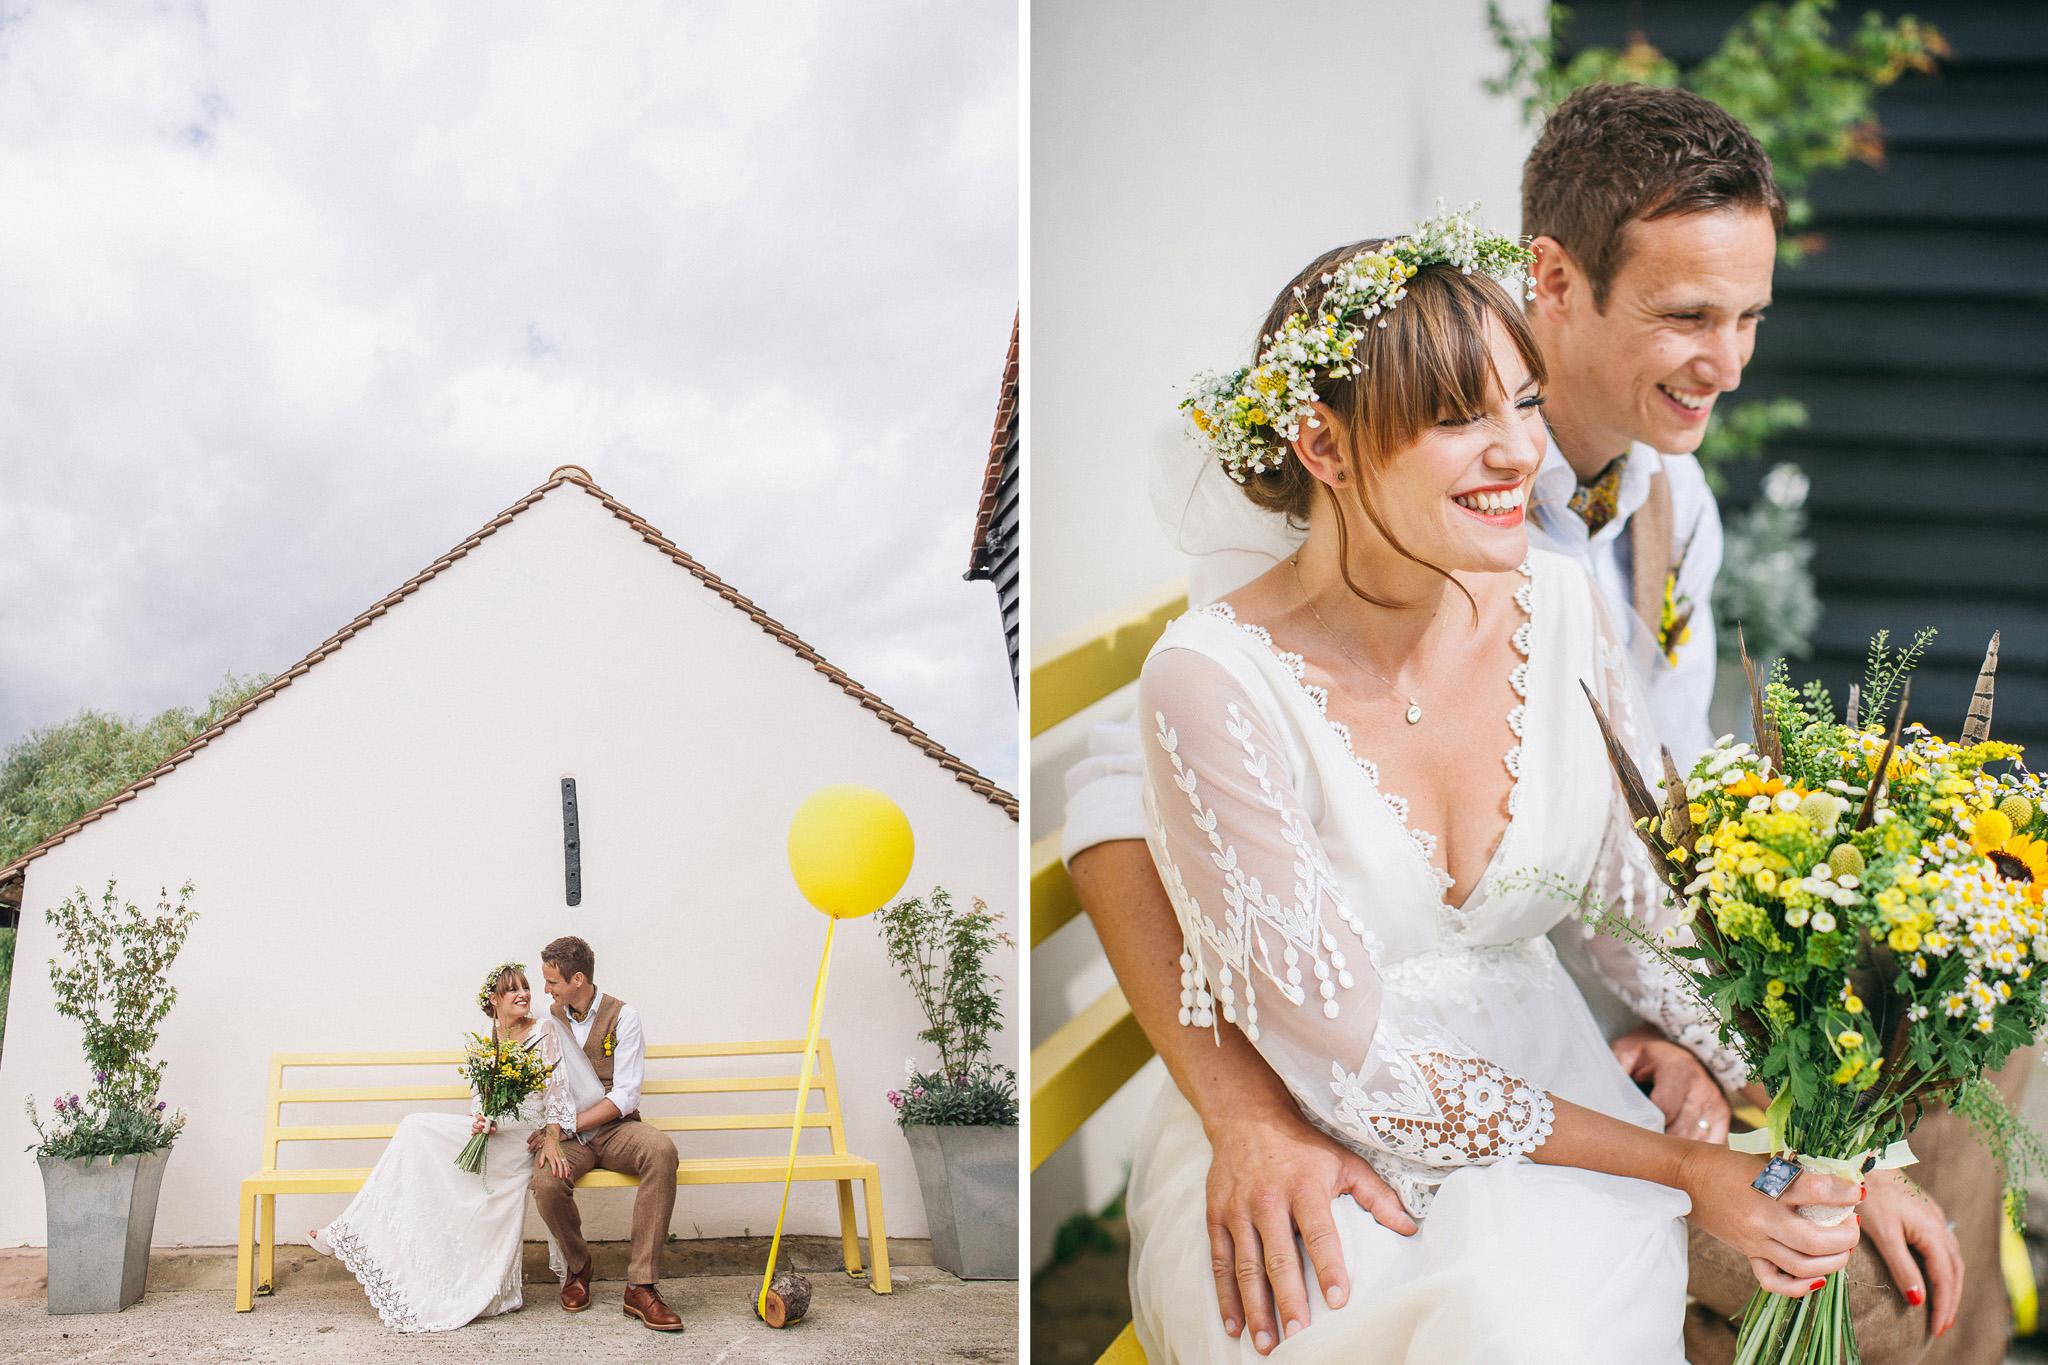 chantry_sussex_barn_wedding_331.jpg